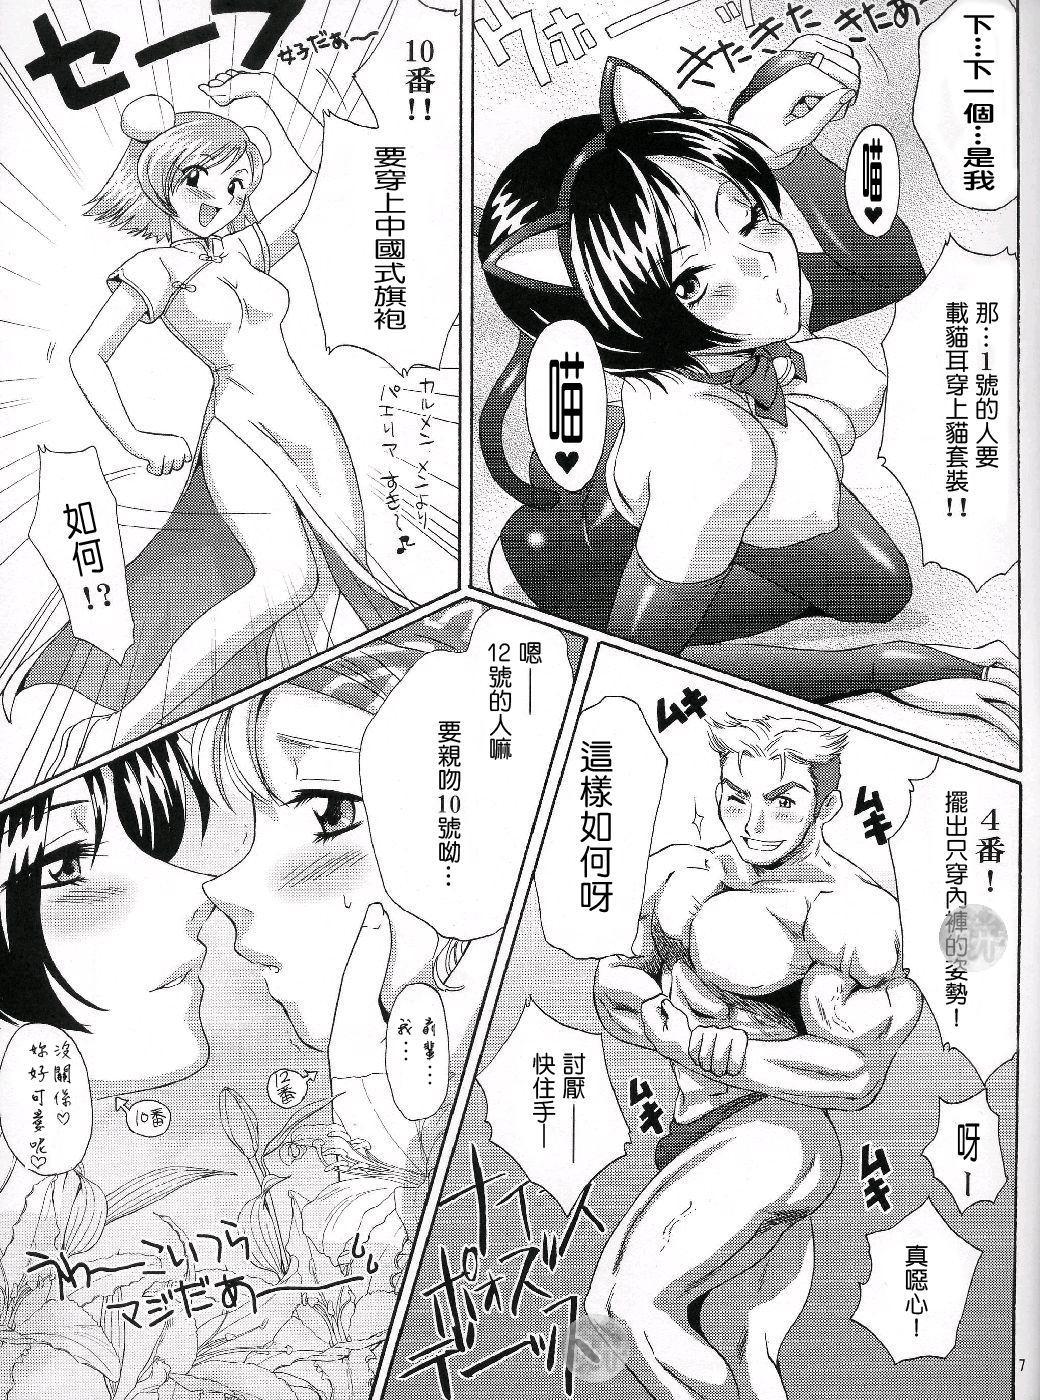 Hakudakueki Gensou Gang Bang March 5